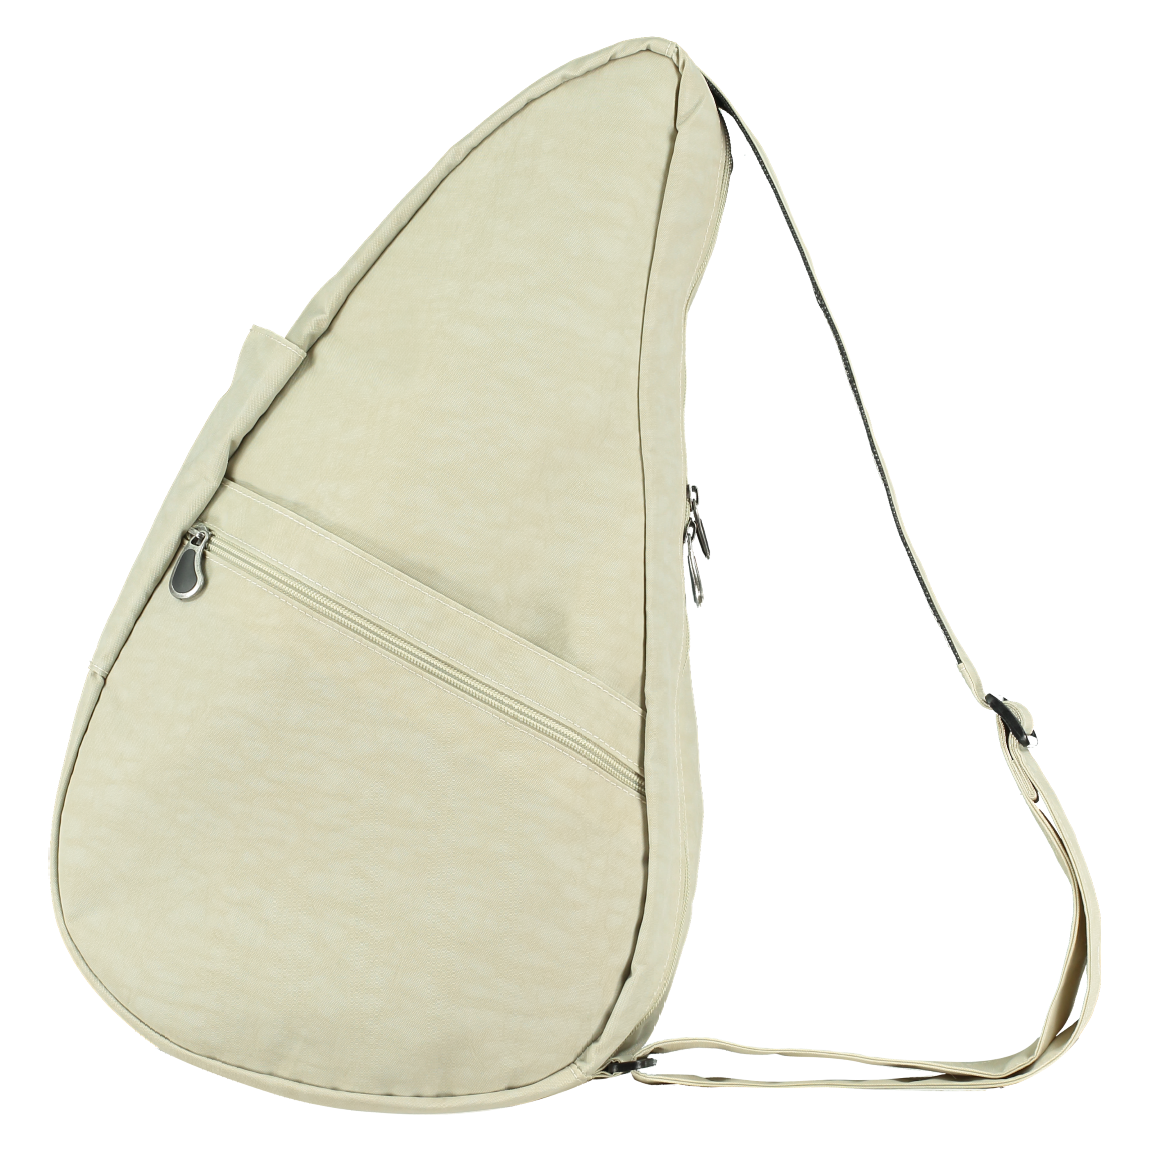 Healthy Back Bag 6304 Textured Nylon Eucalyptus M